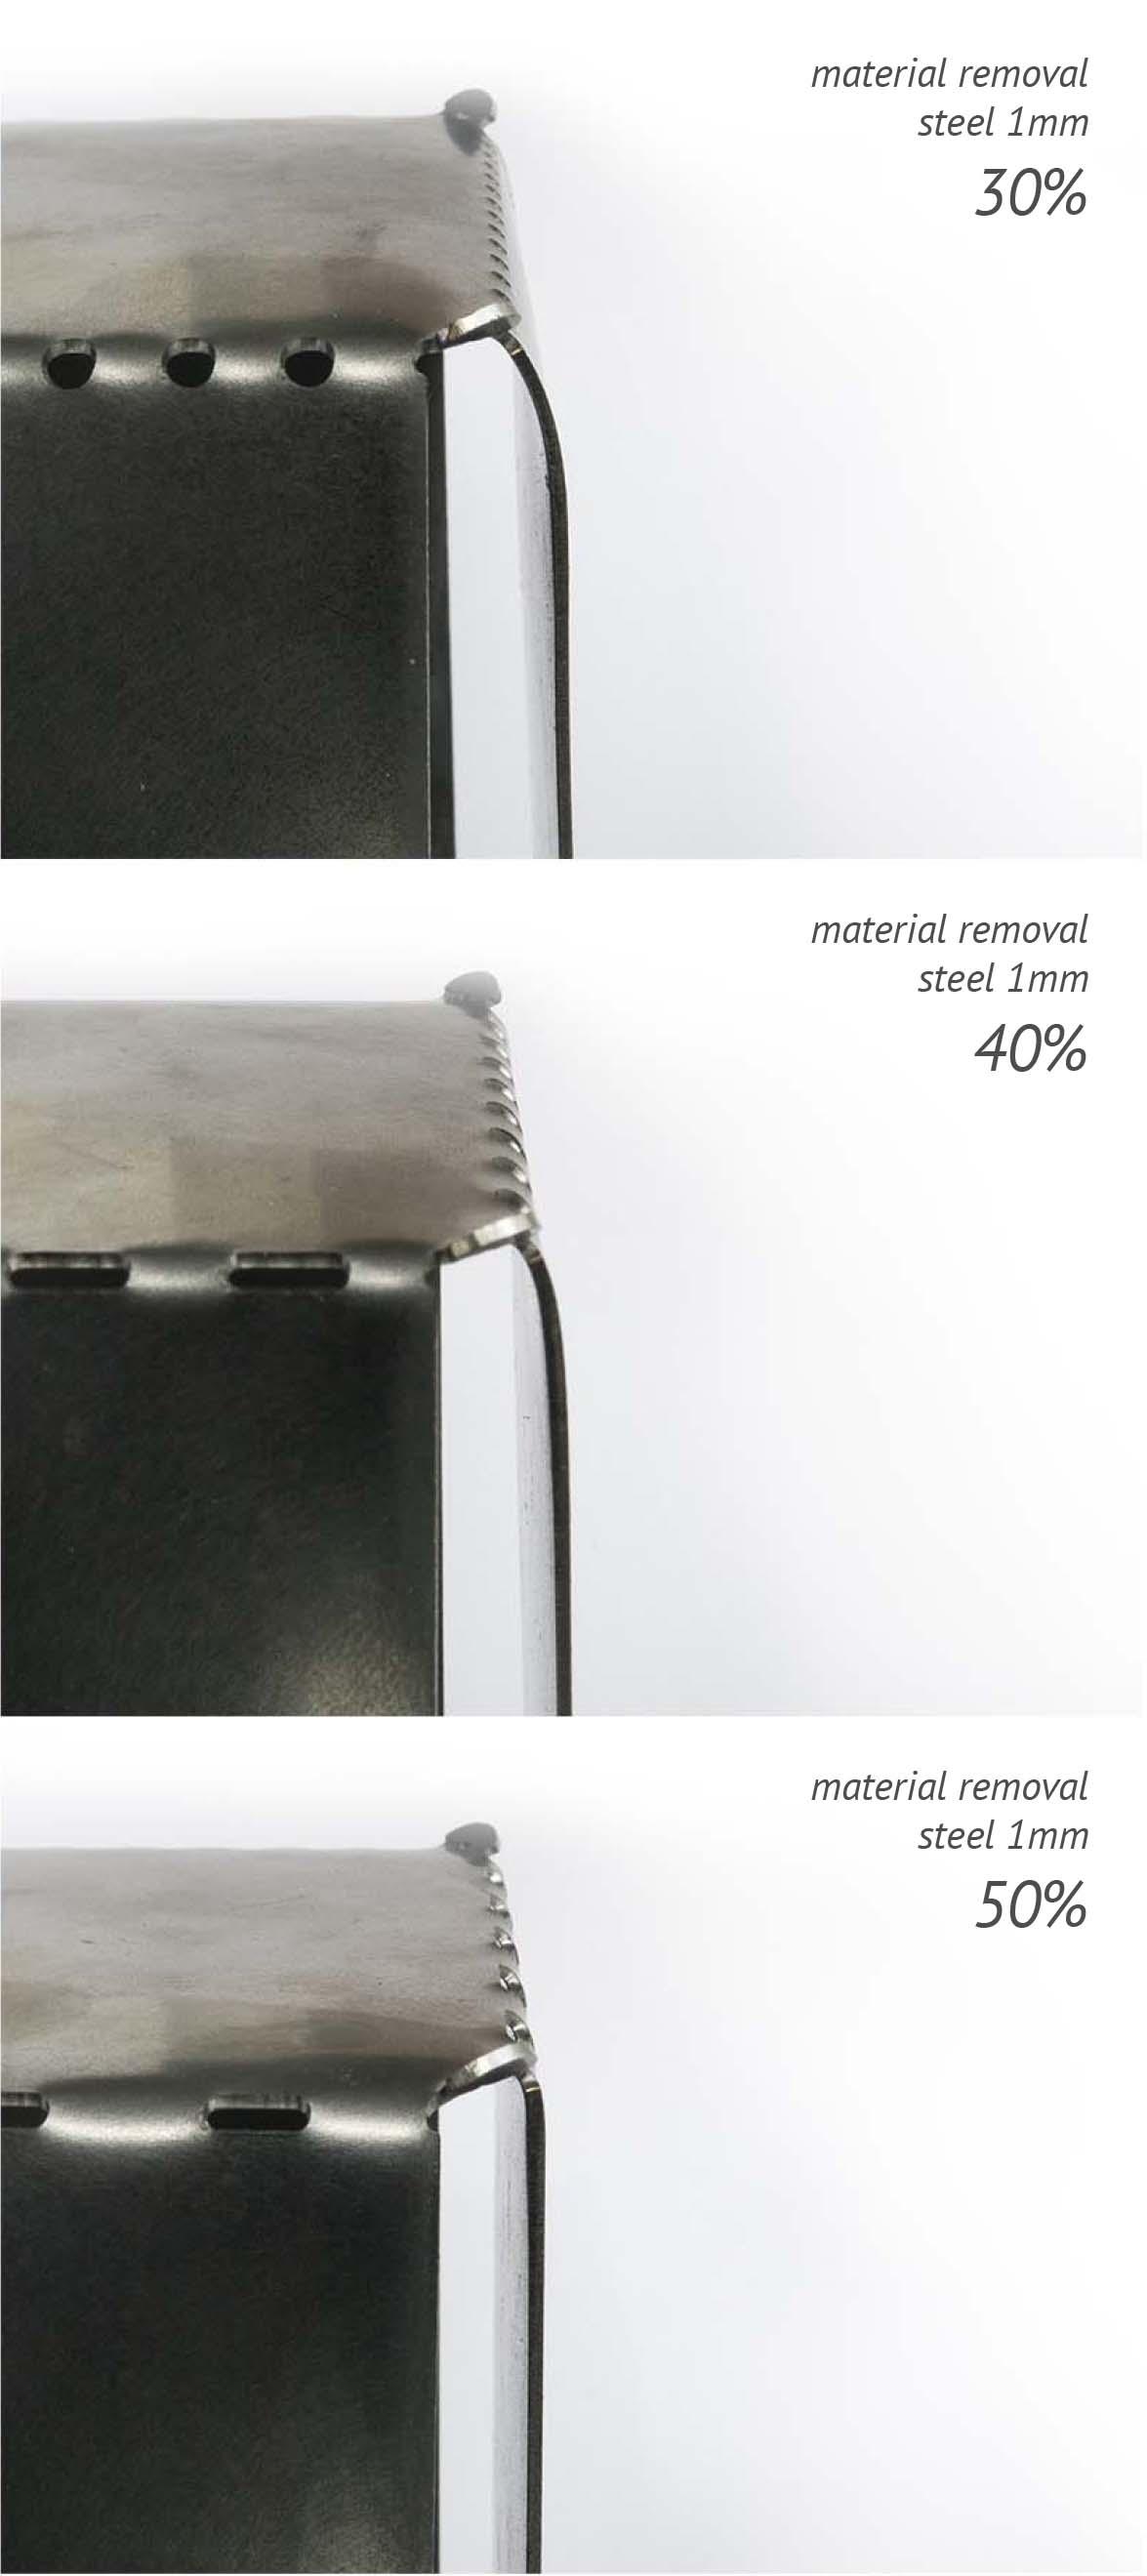 Compare folding deformation